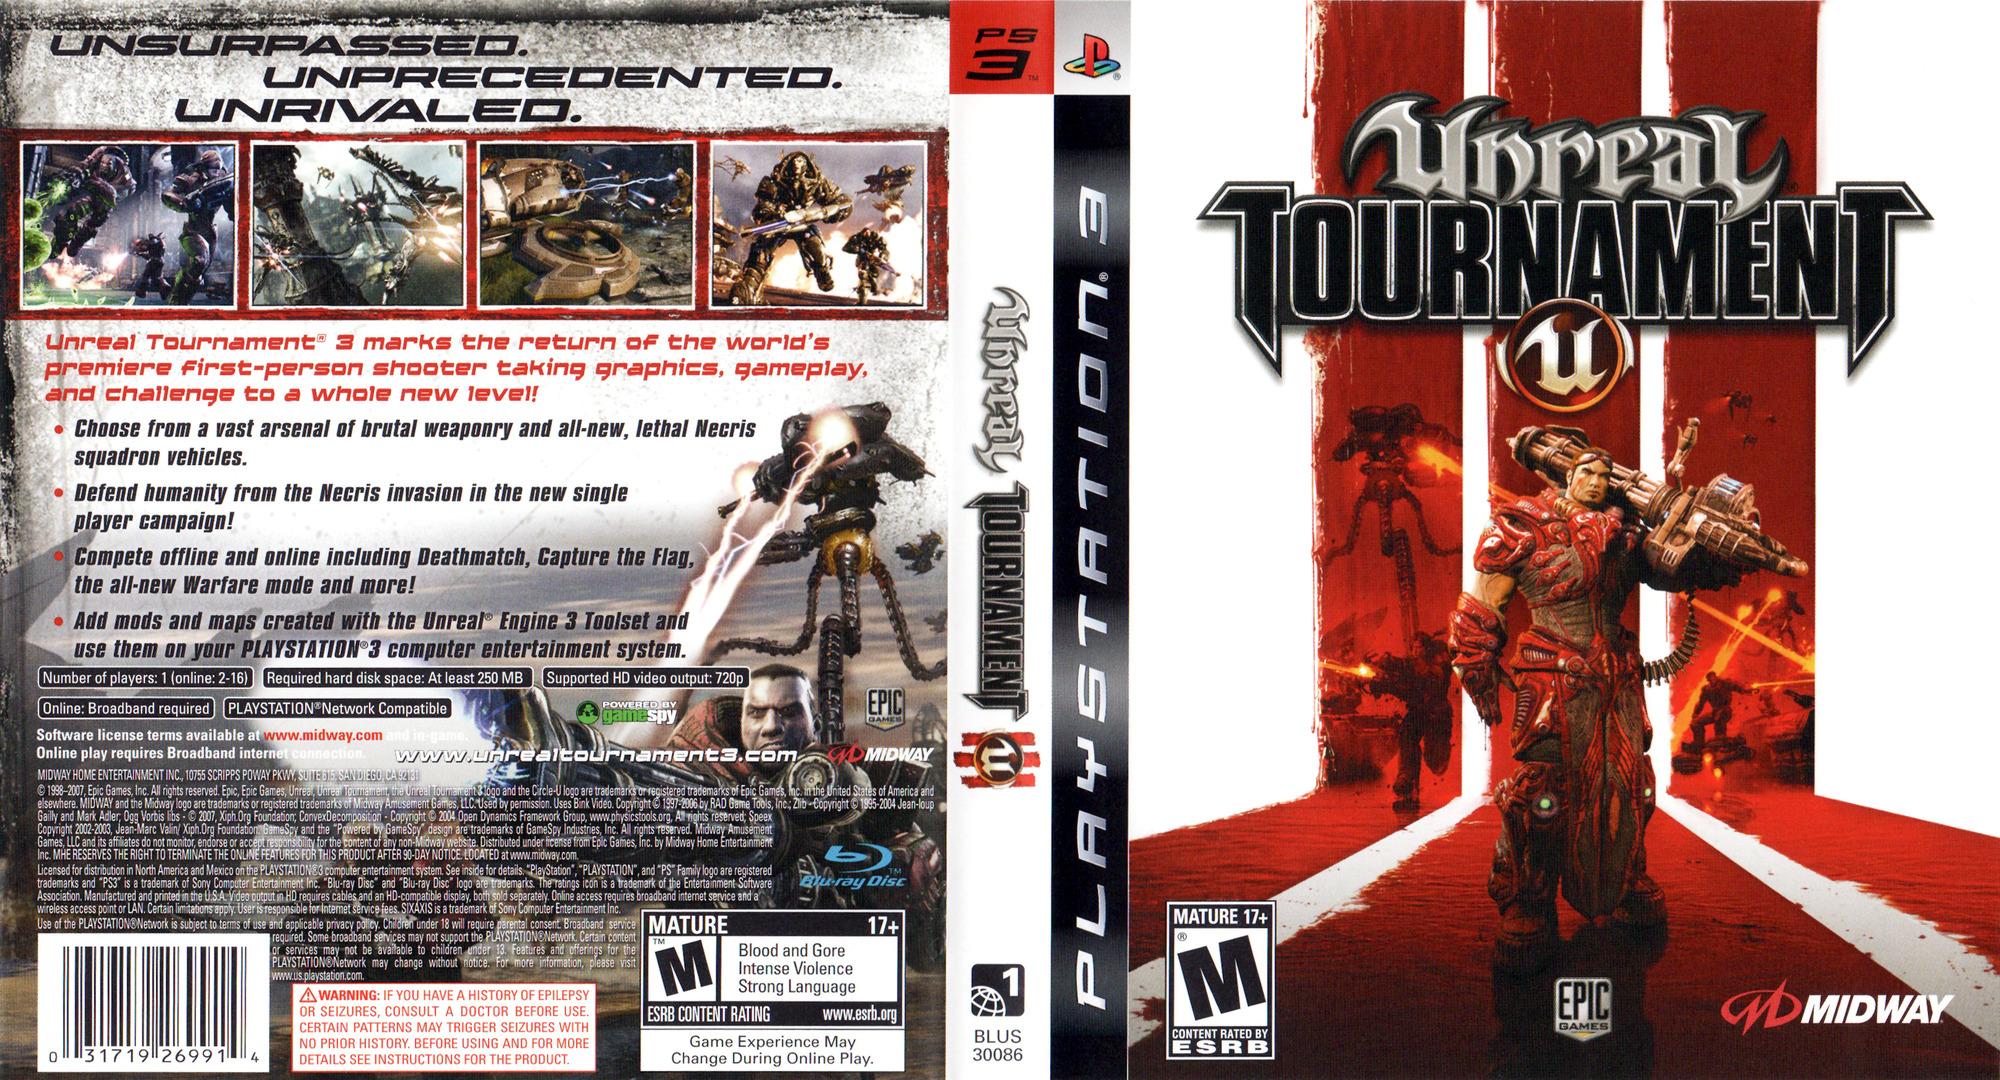 Unreal Tournament III PS3 coverfullHQ (BLUS30086)